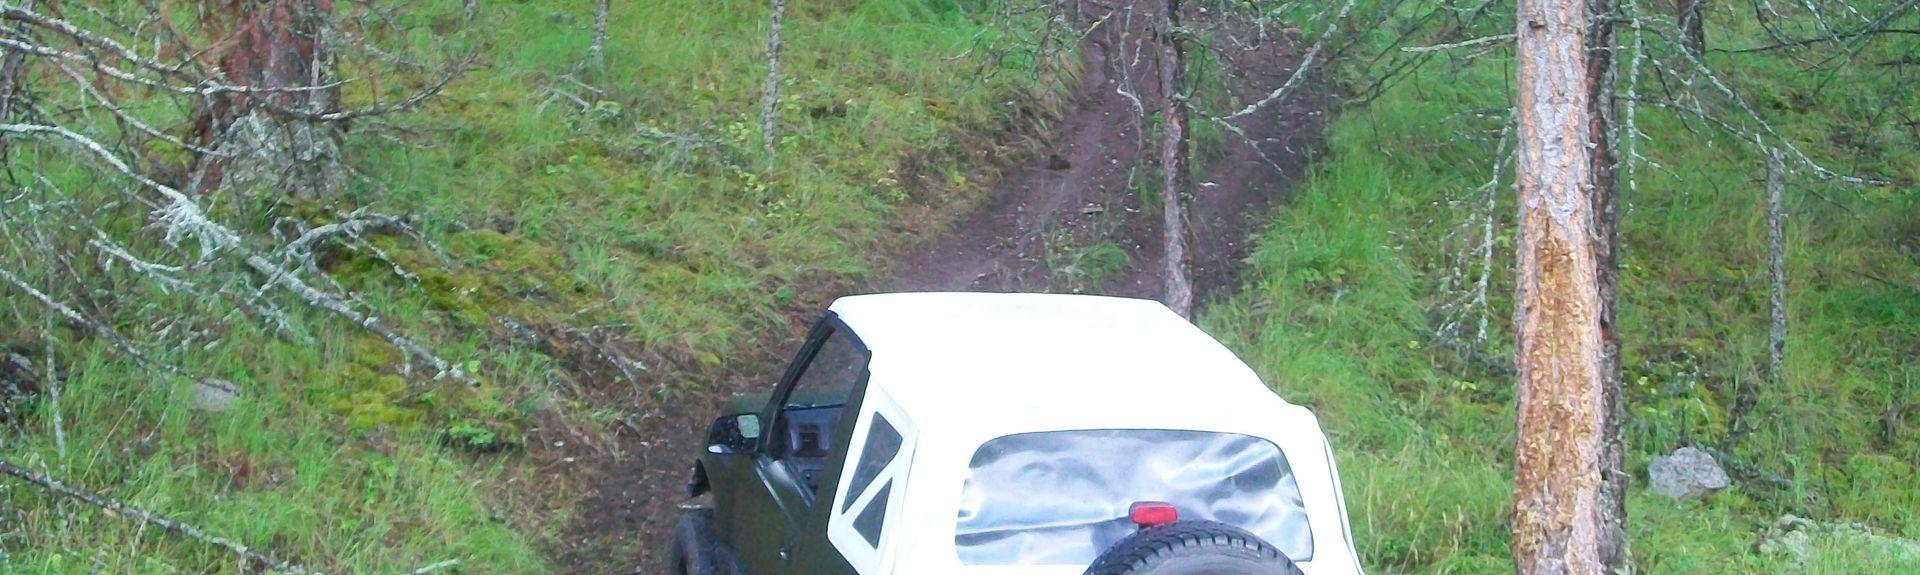 Predator Ridge - Predator Course, Vernon, British Columbia, Canada